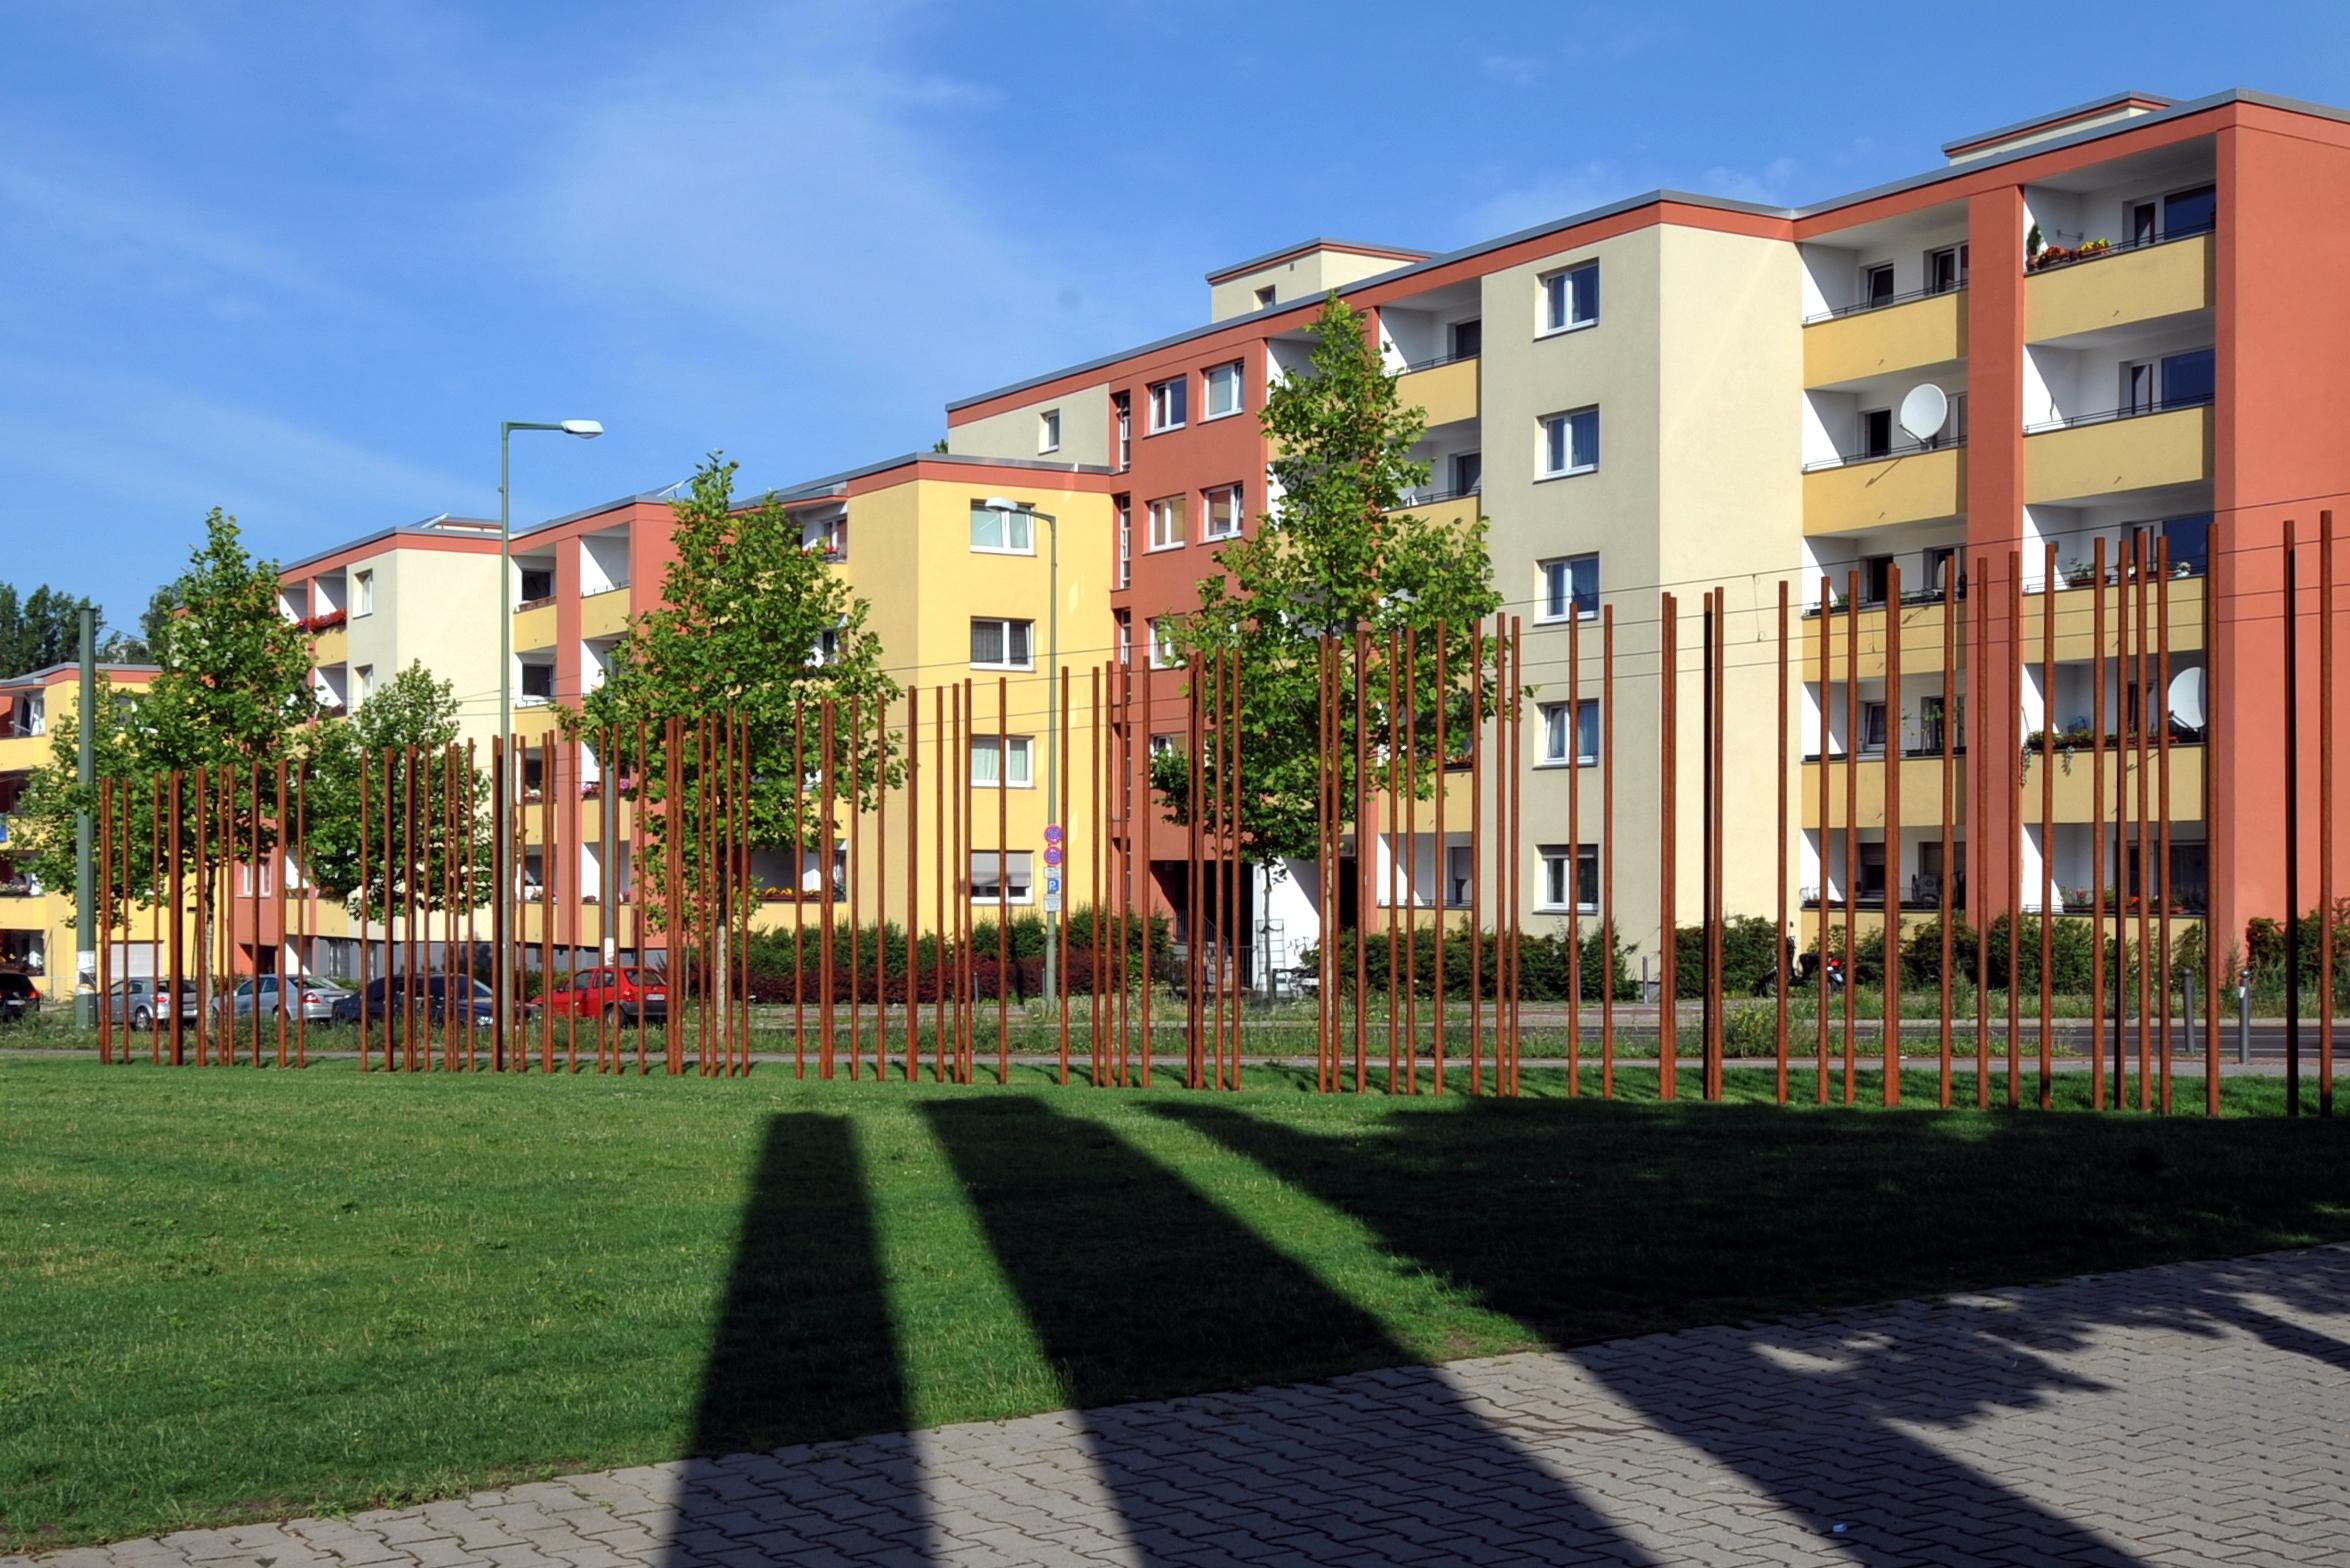 Datei:Gedenkstaette Berliner Mauer 03.jpg – Wikipedia